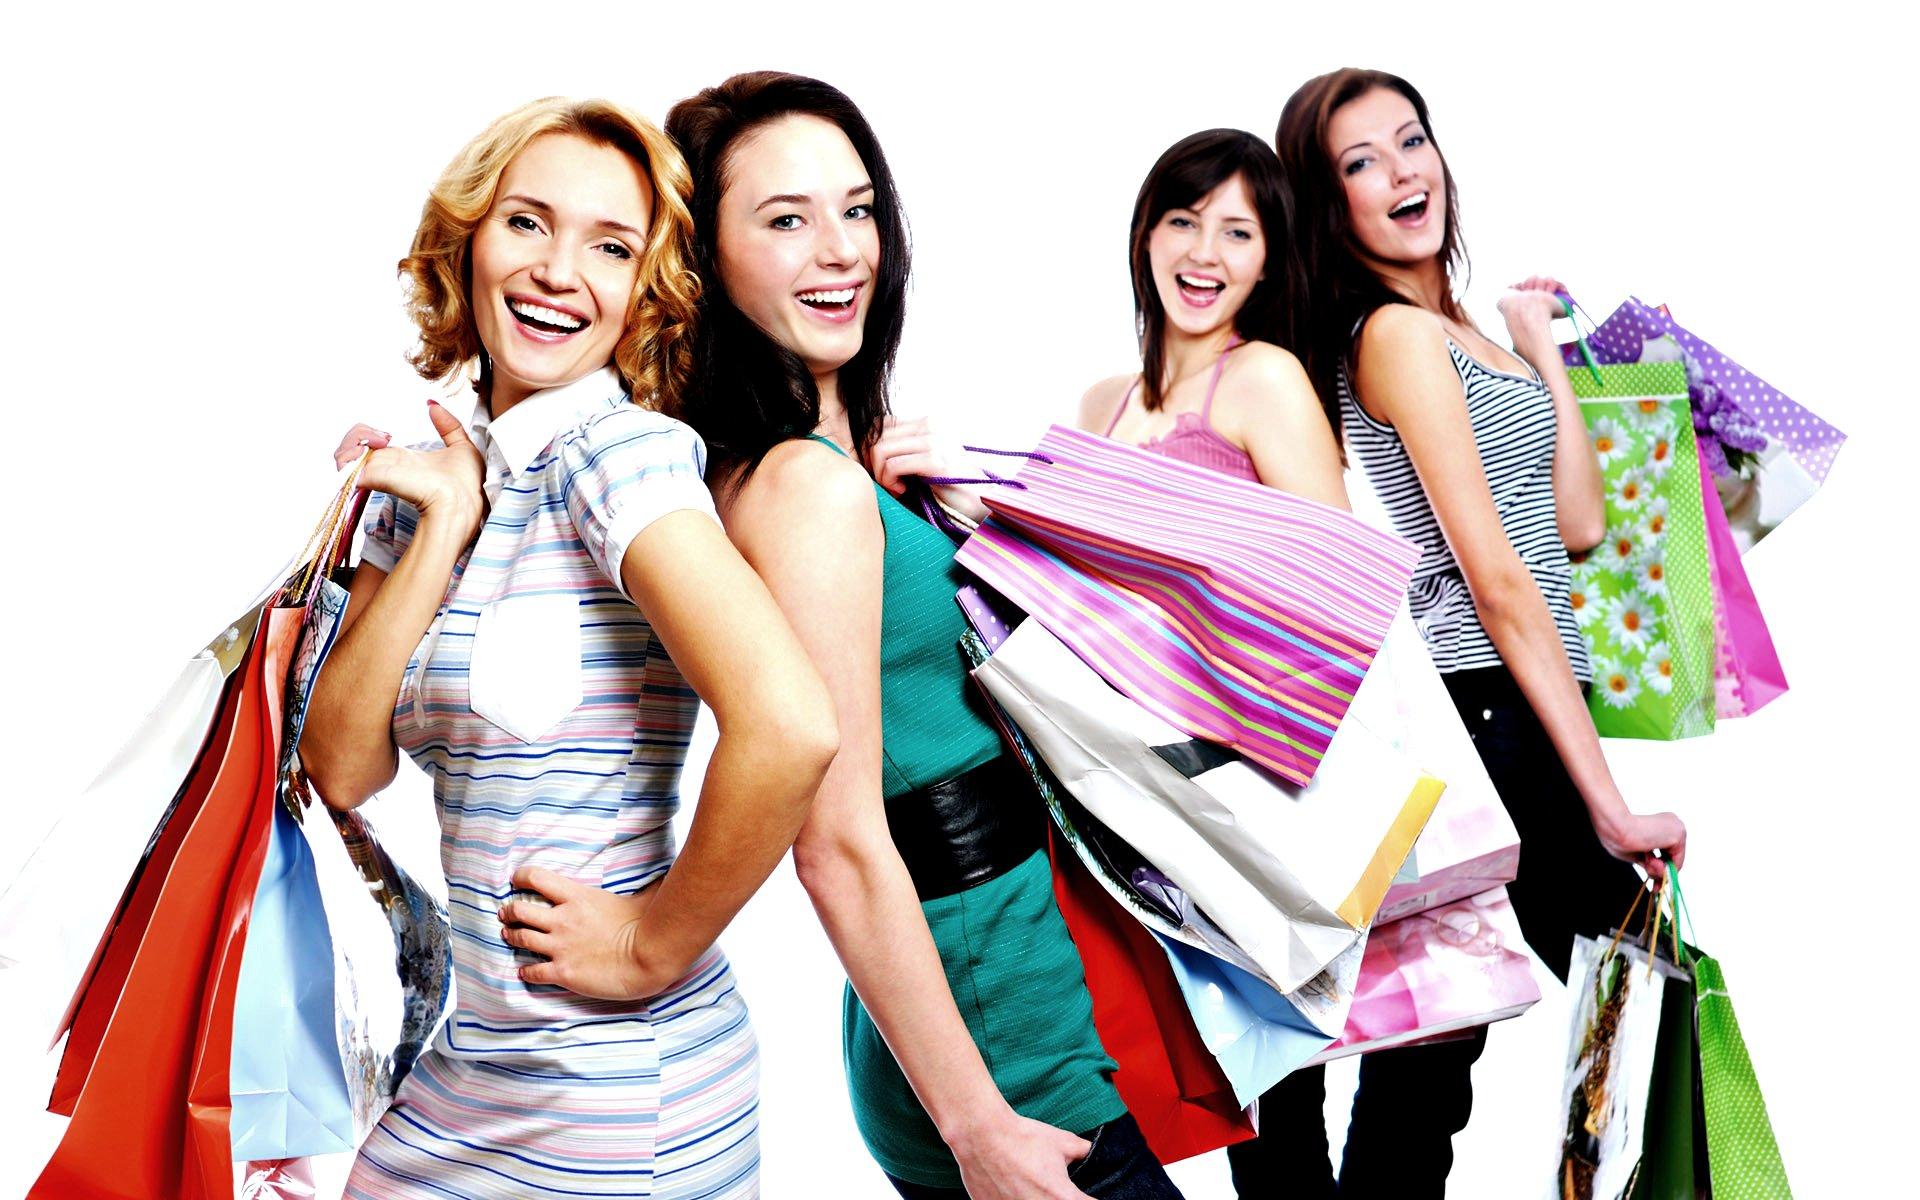 ООО Стенфорд одежда из трикотажа мужской трикотаж